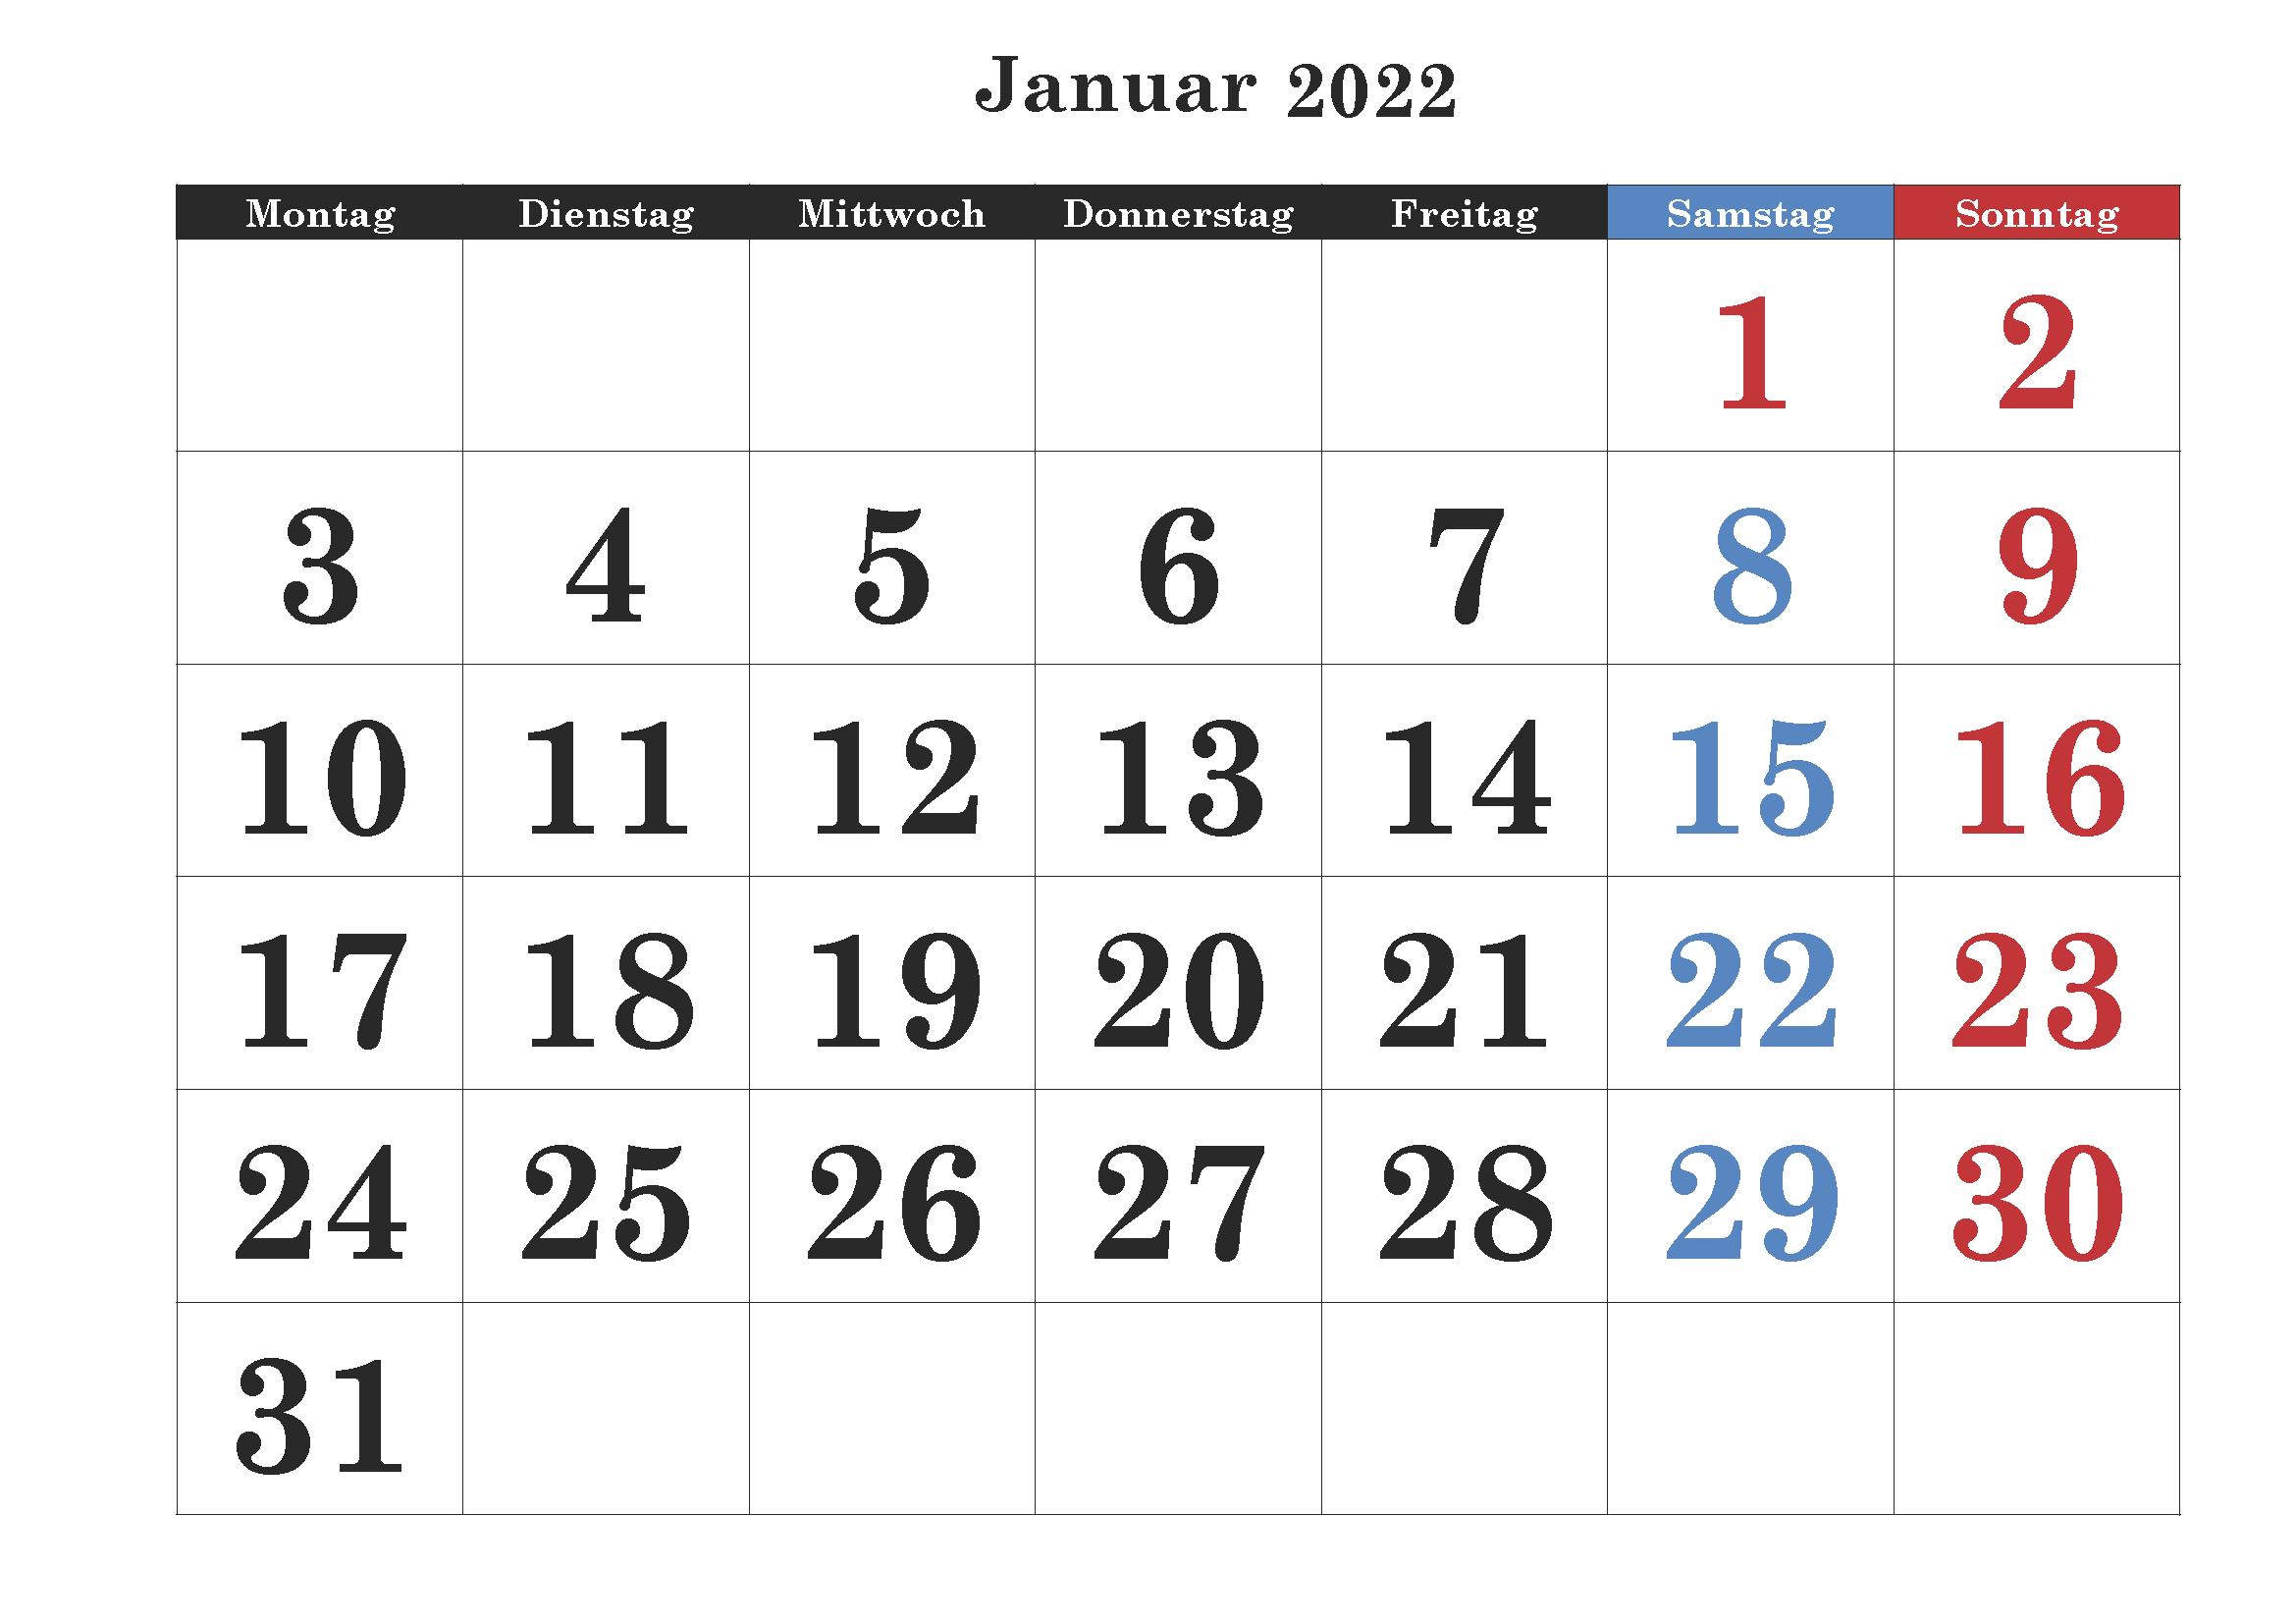 Januar Kalender 2022 Zum Ausdrucken